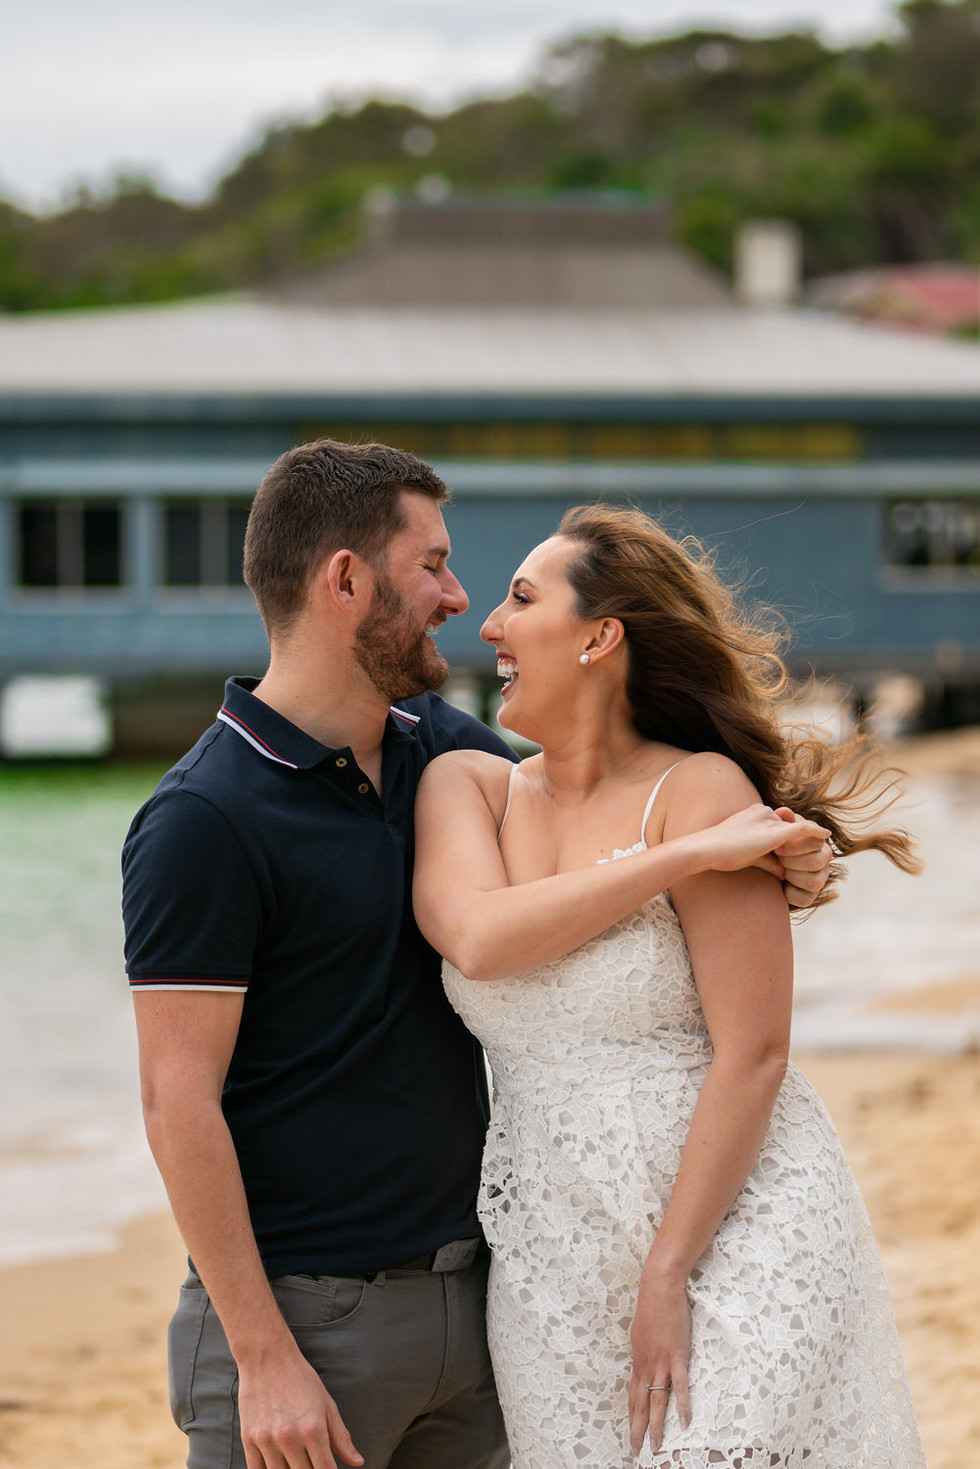 sydney-best-wedding-photographer (5).jpg